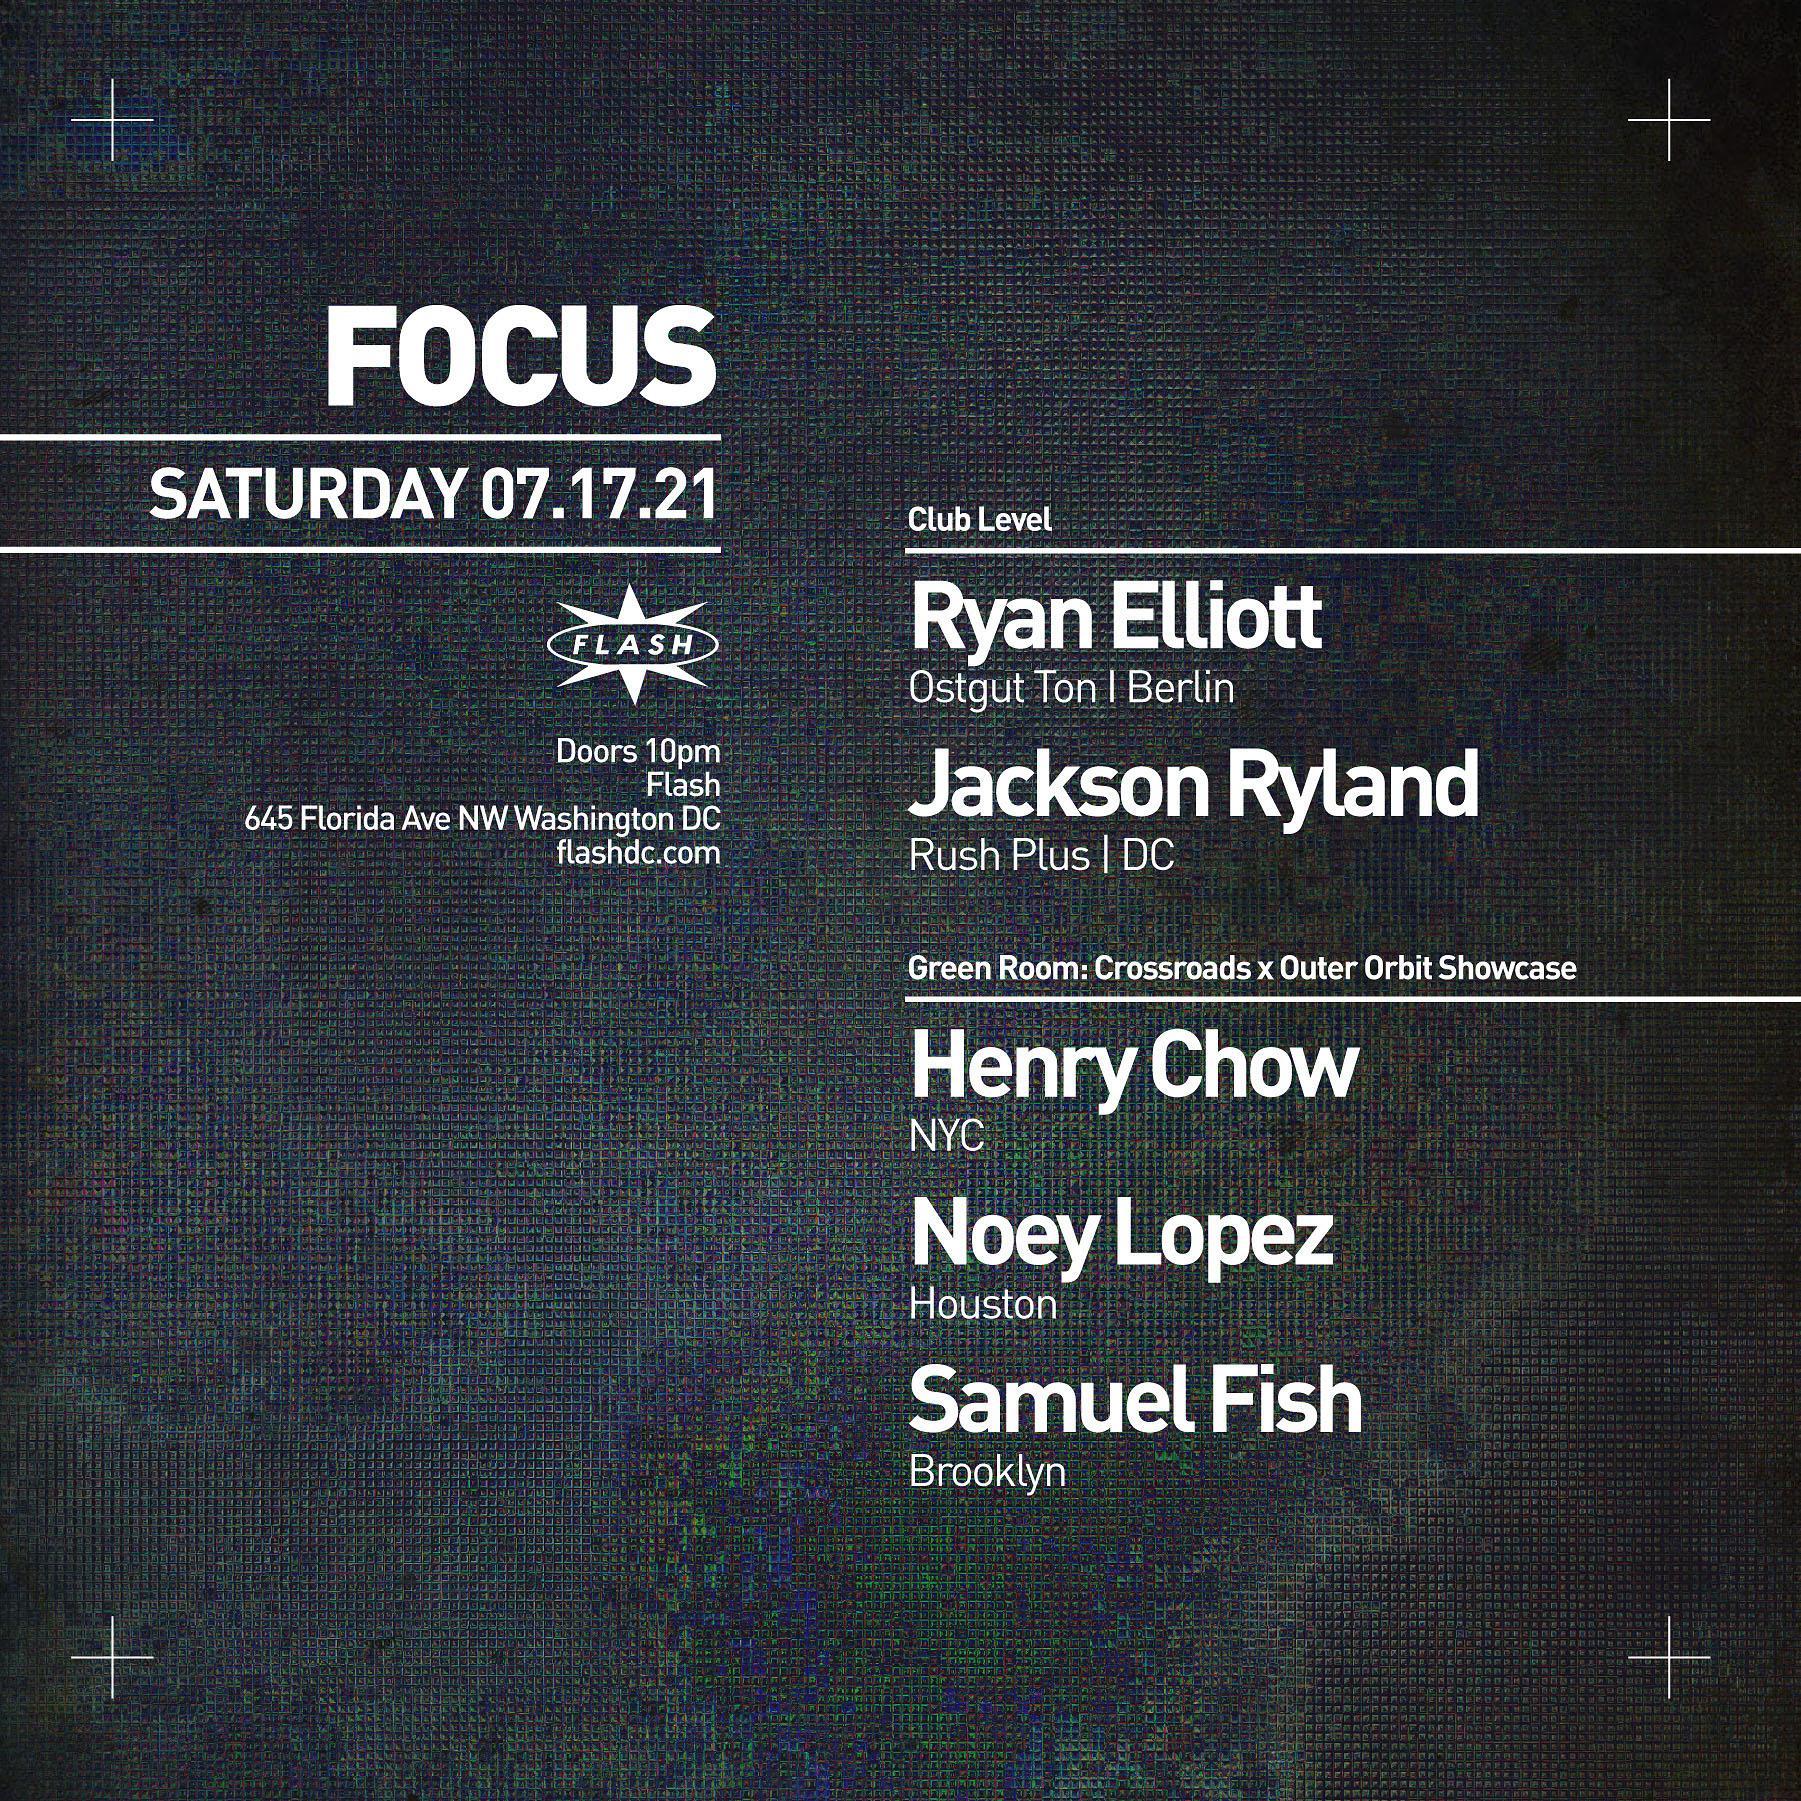 FOCUS: Ryan Elliot - Jackson Ryland - Henry Chow - Noey Lopez - Samuel Fish event thumbnail